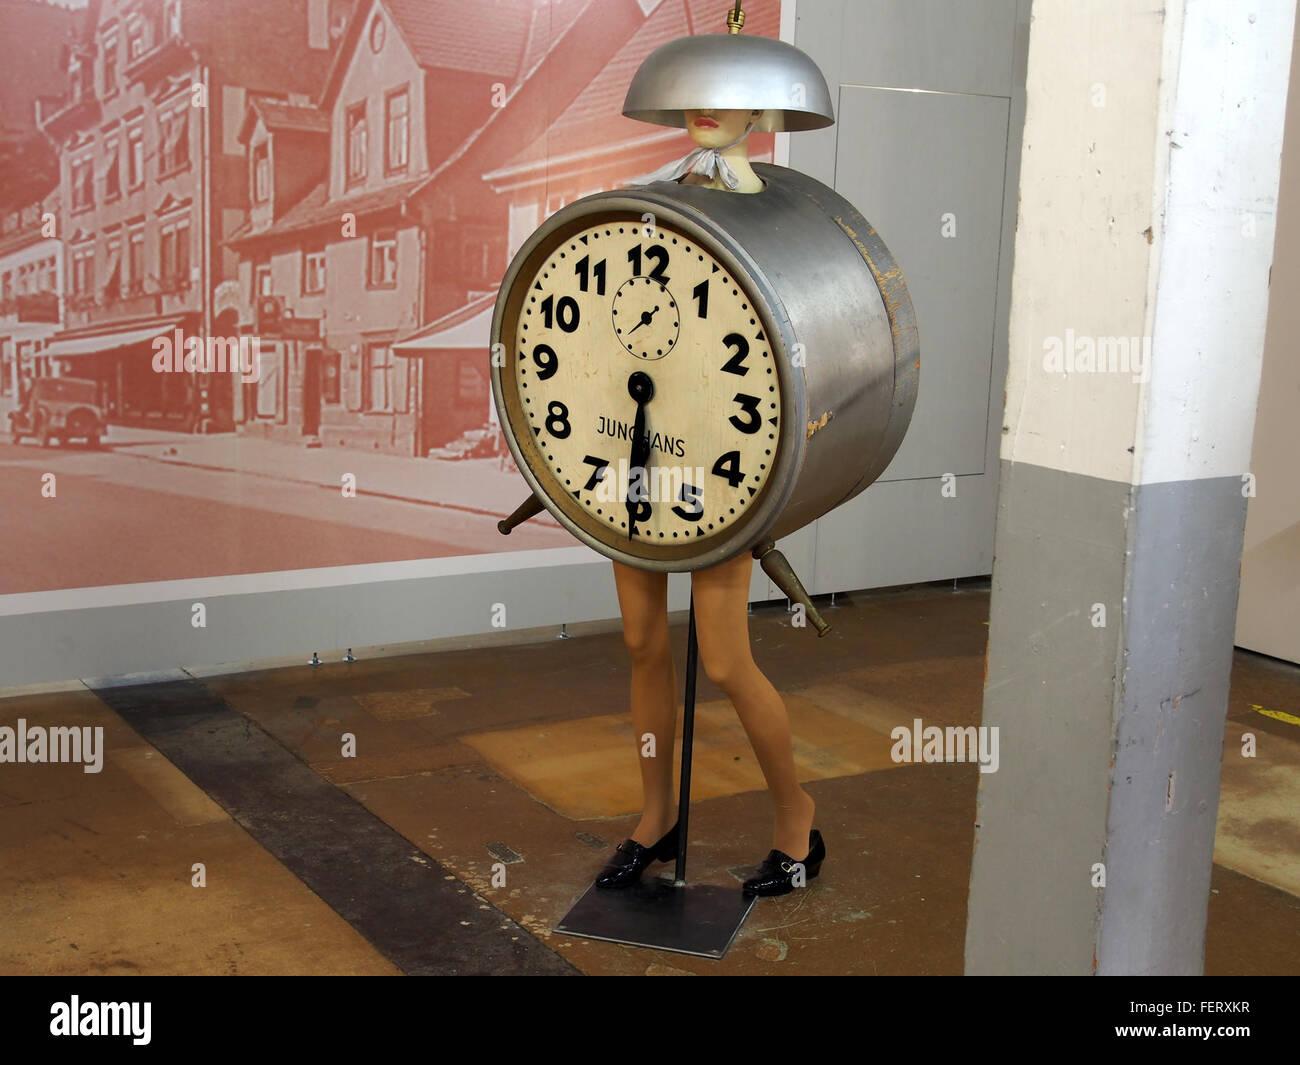 Auto & Uhrenwelt Schramberg, werbung - Stock Image